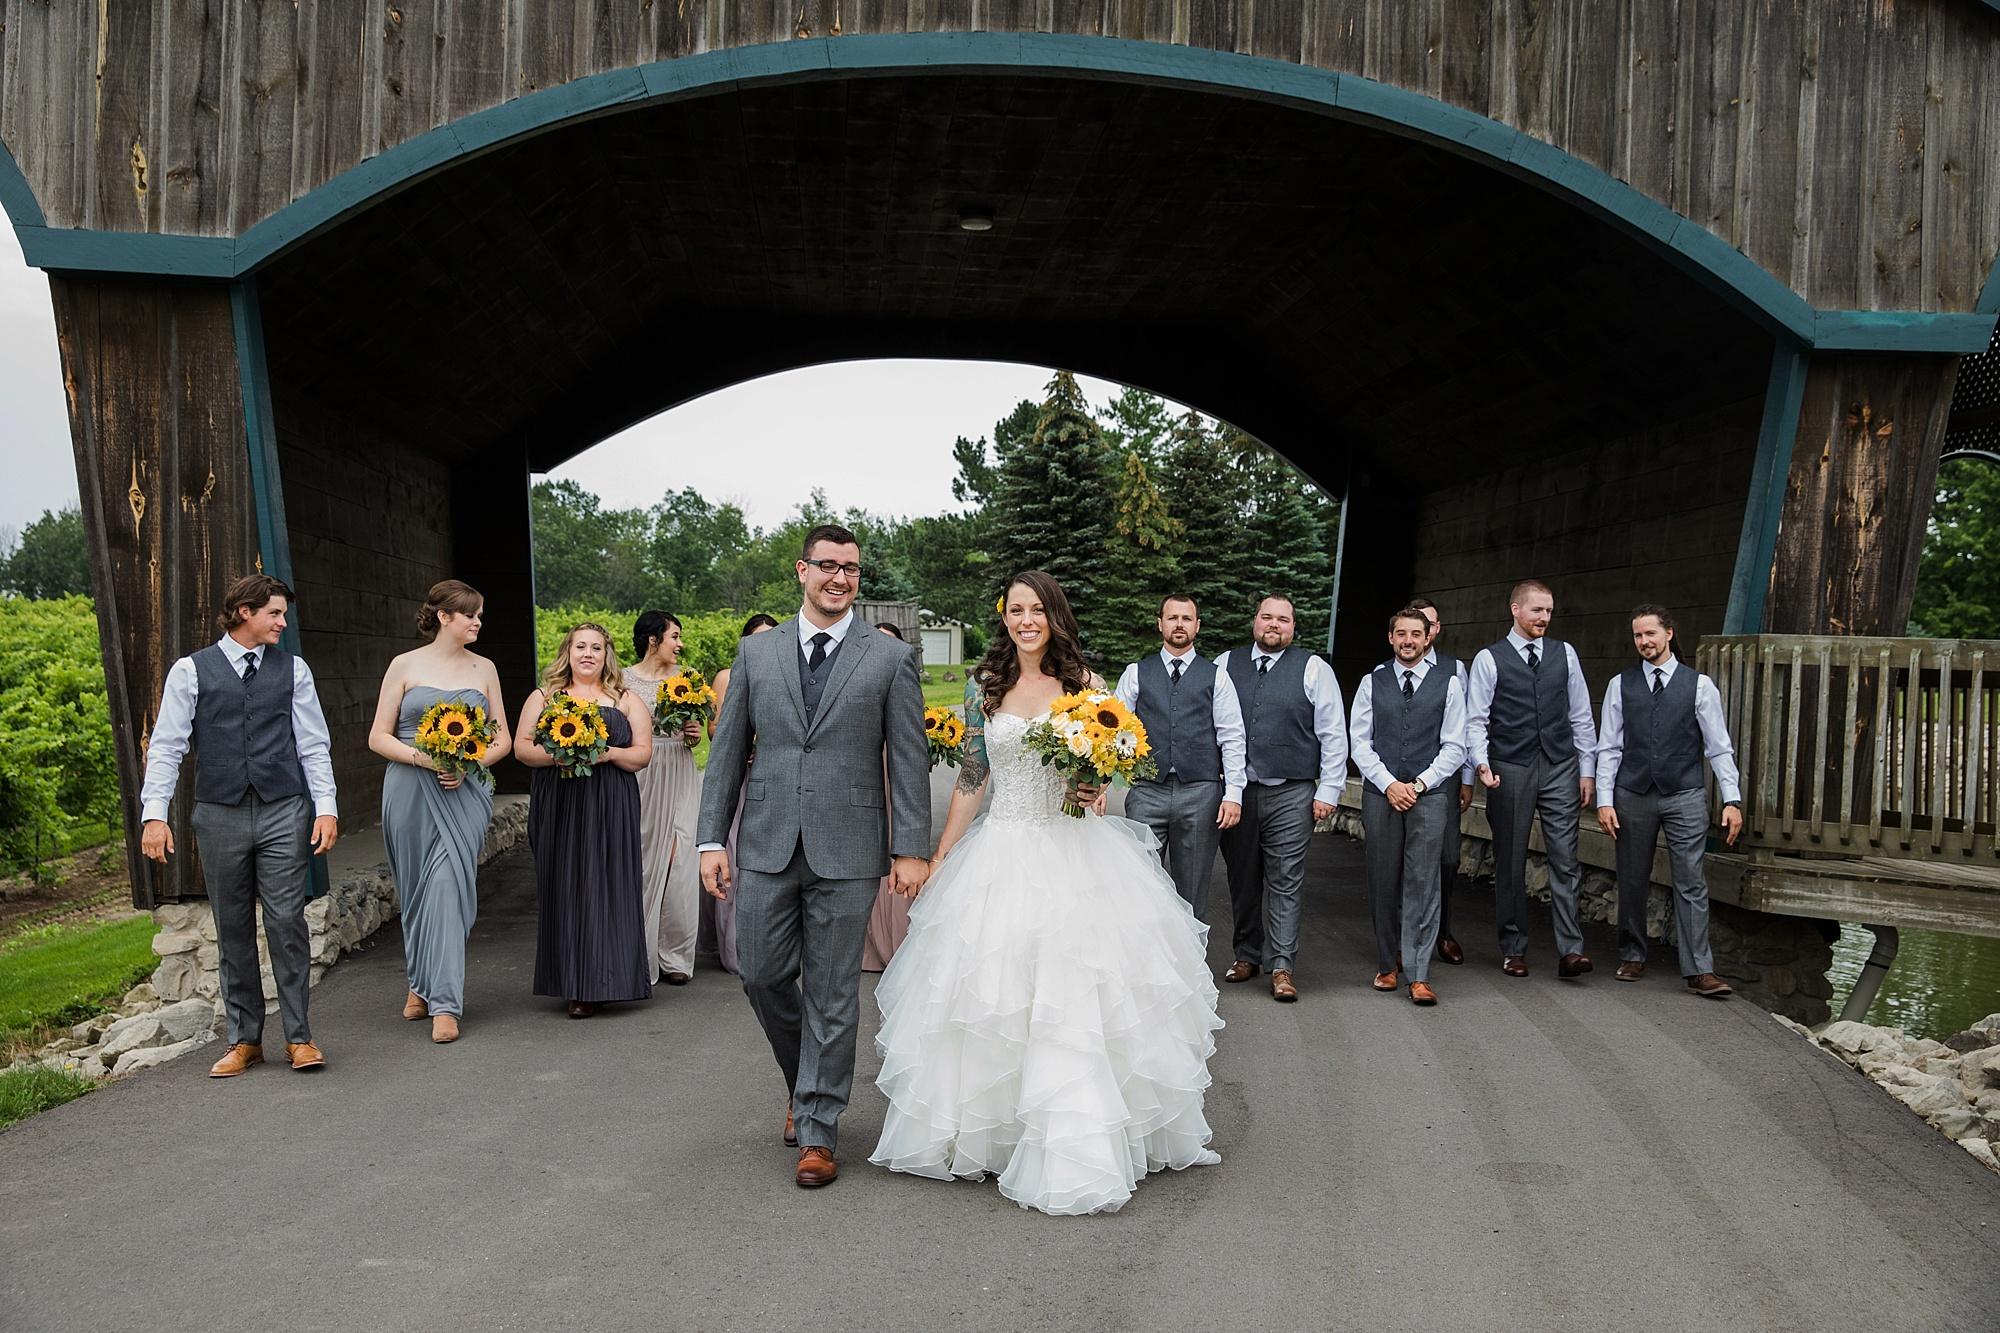 lipapark-hernderwinery-wedding_0037.jpg